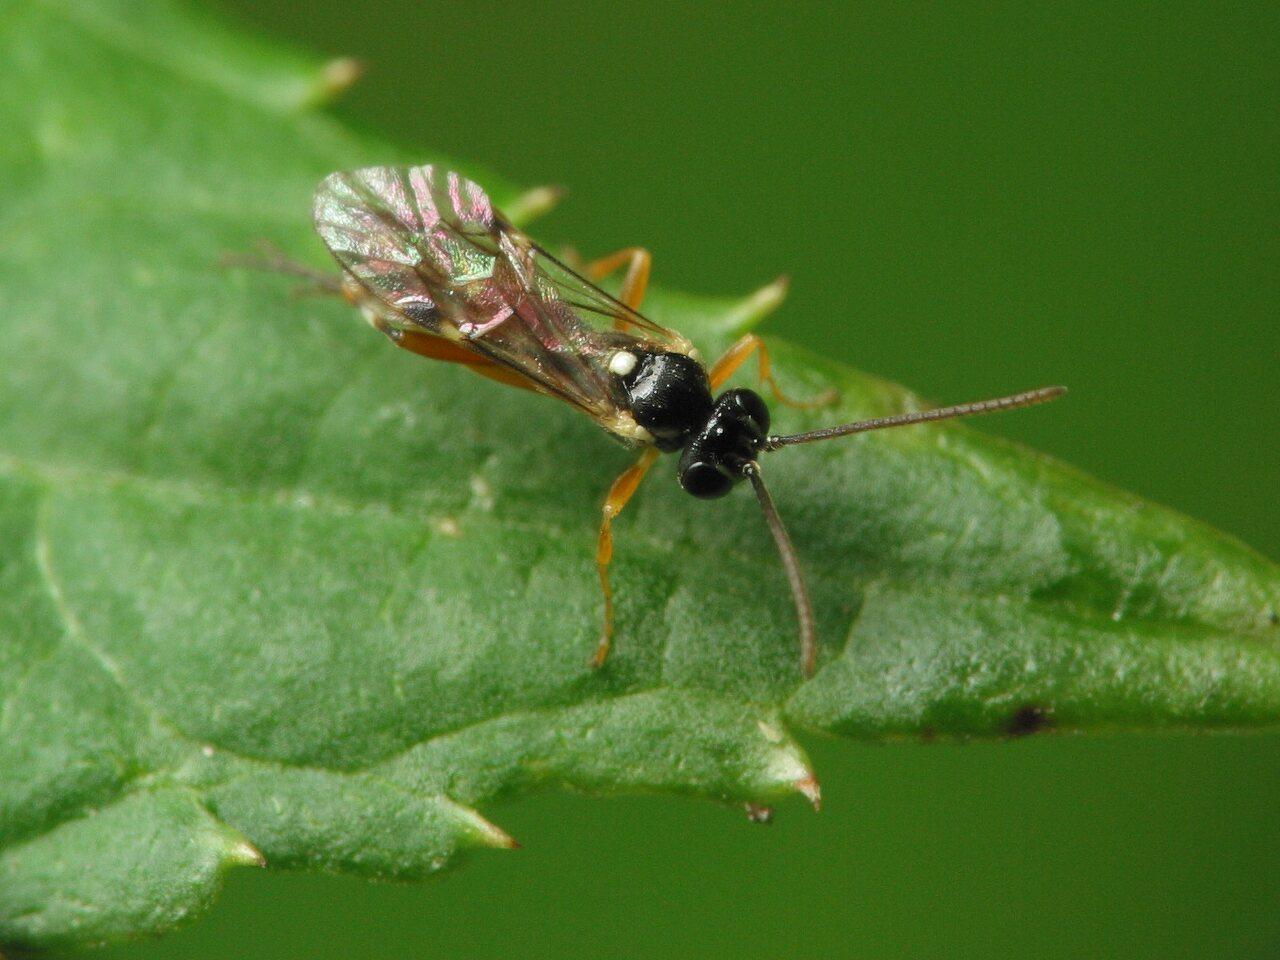 Hymenoptera-4164.jpg